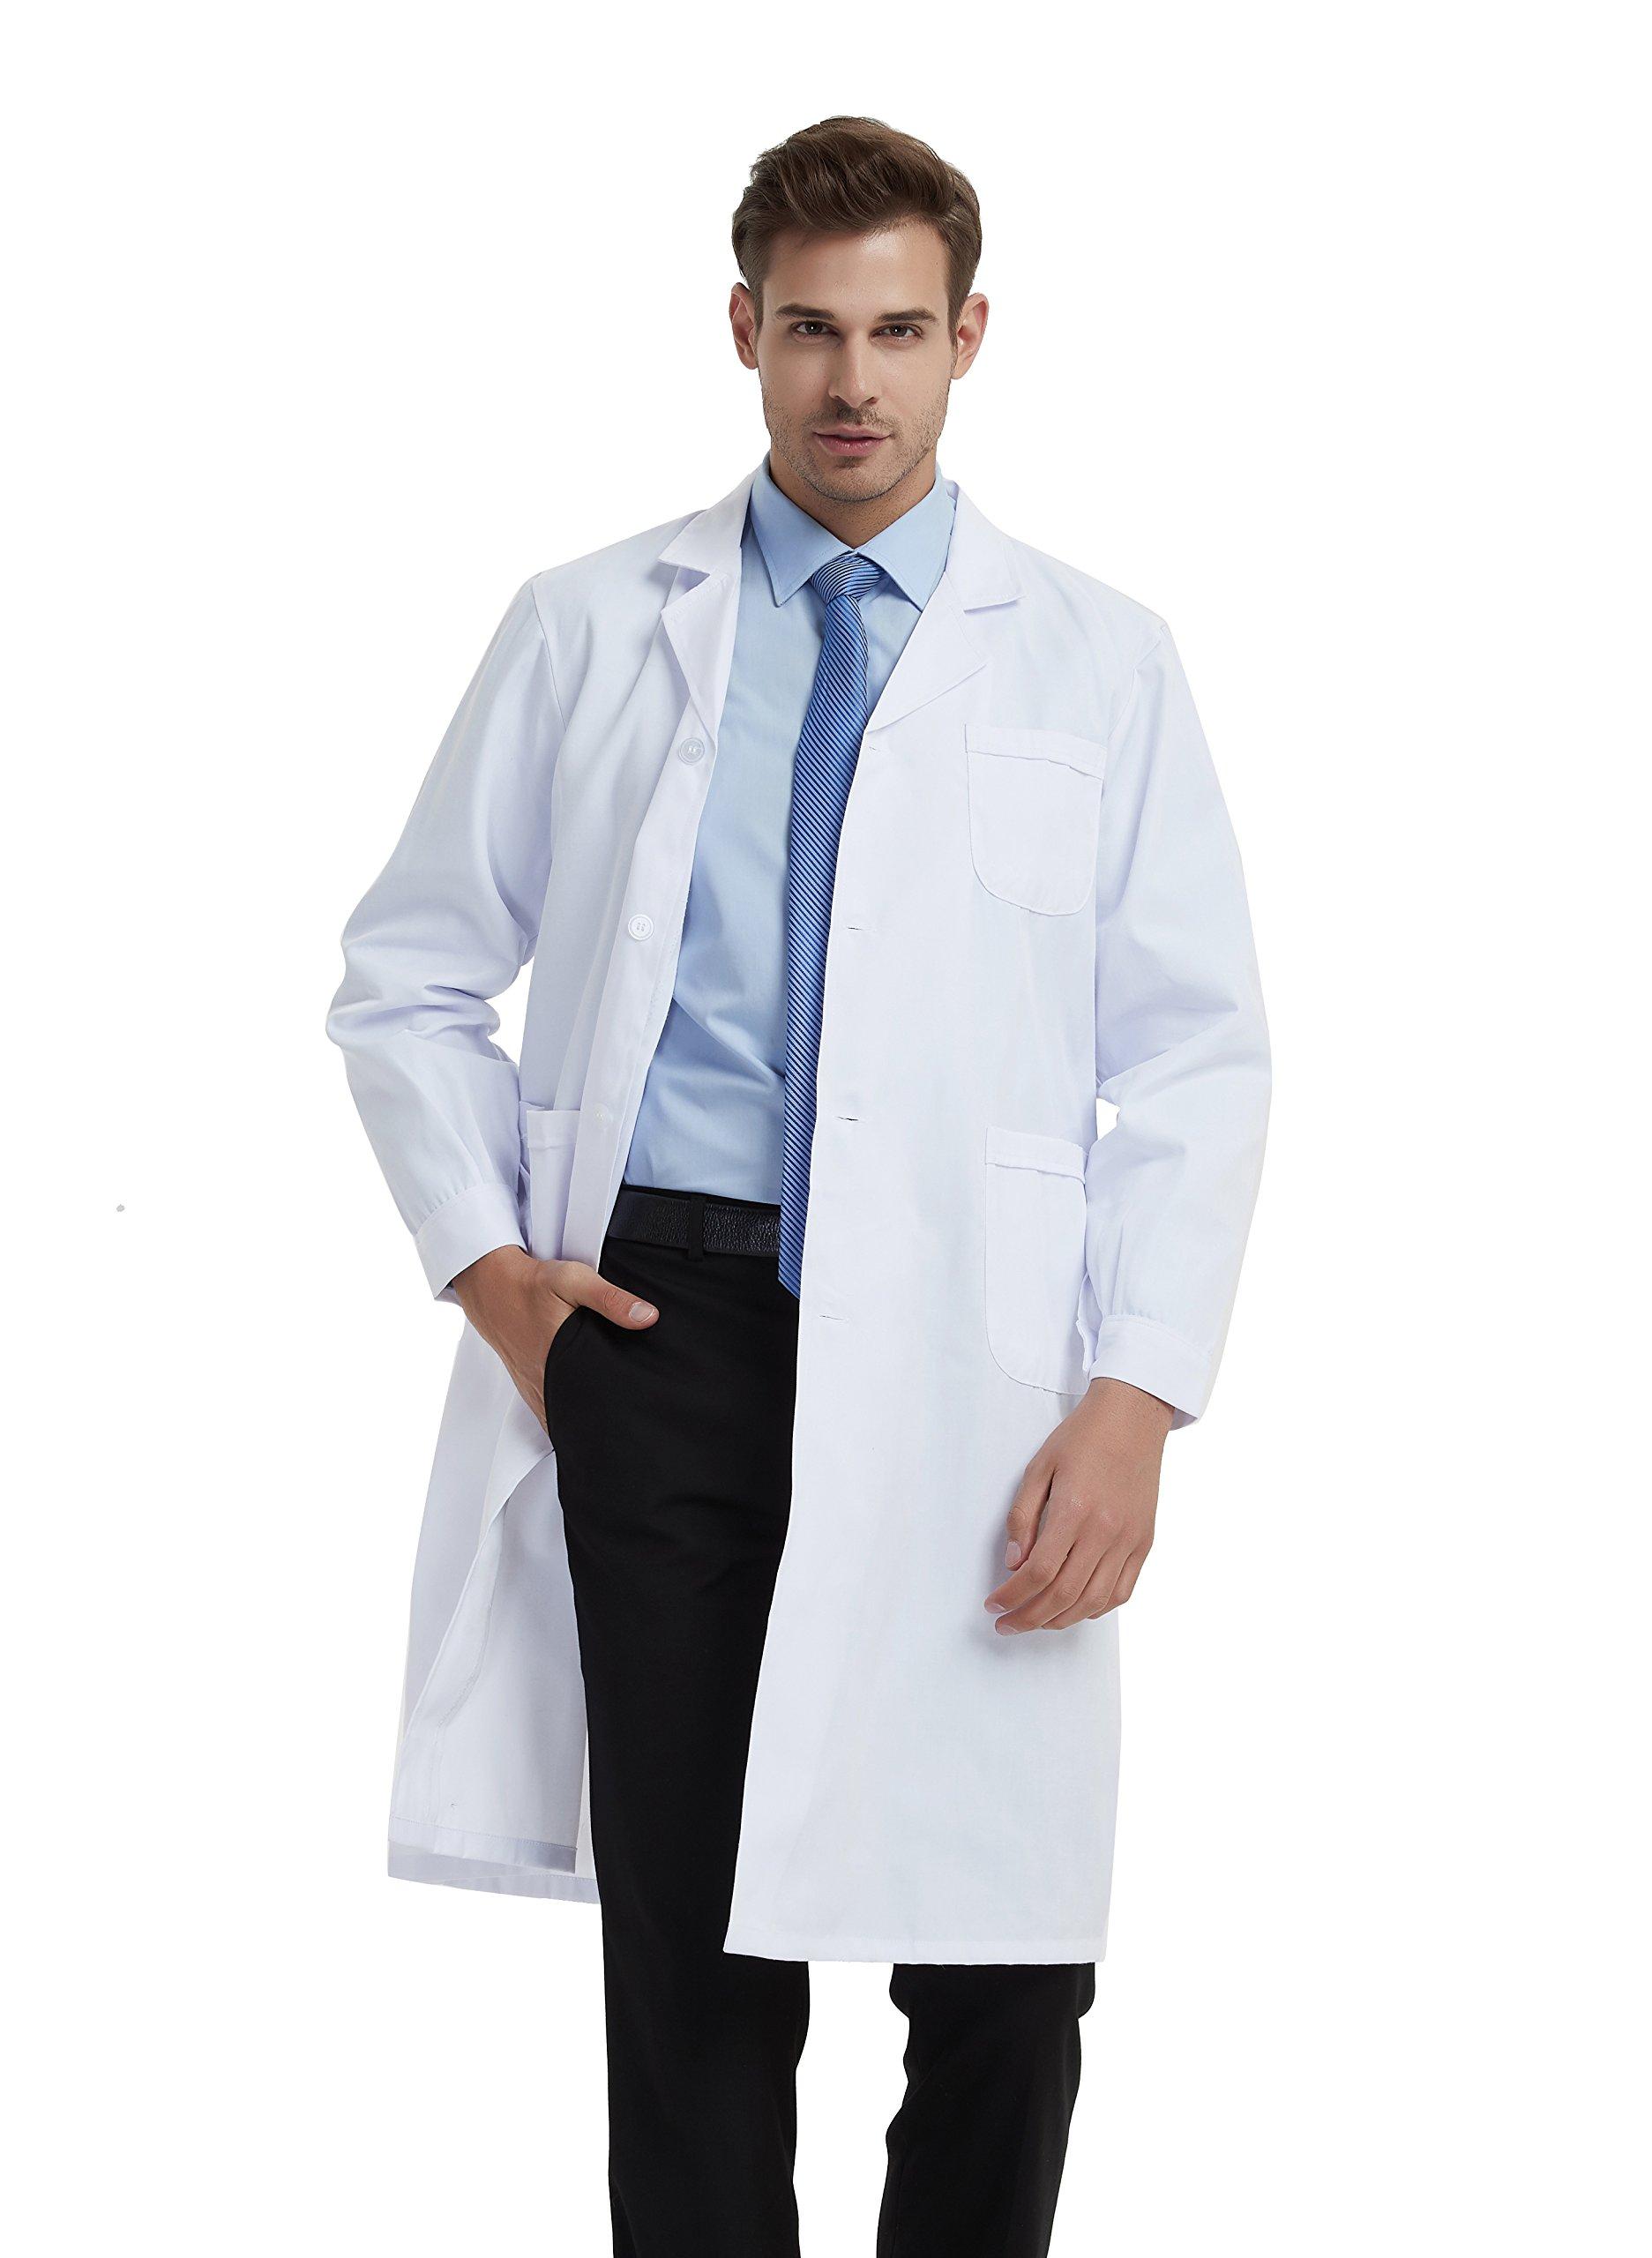 BSTT Men Lab Coat White Medical Uniforms Scrubs 2018 New Improvement Buttoned Sleeves Thin L